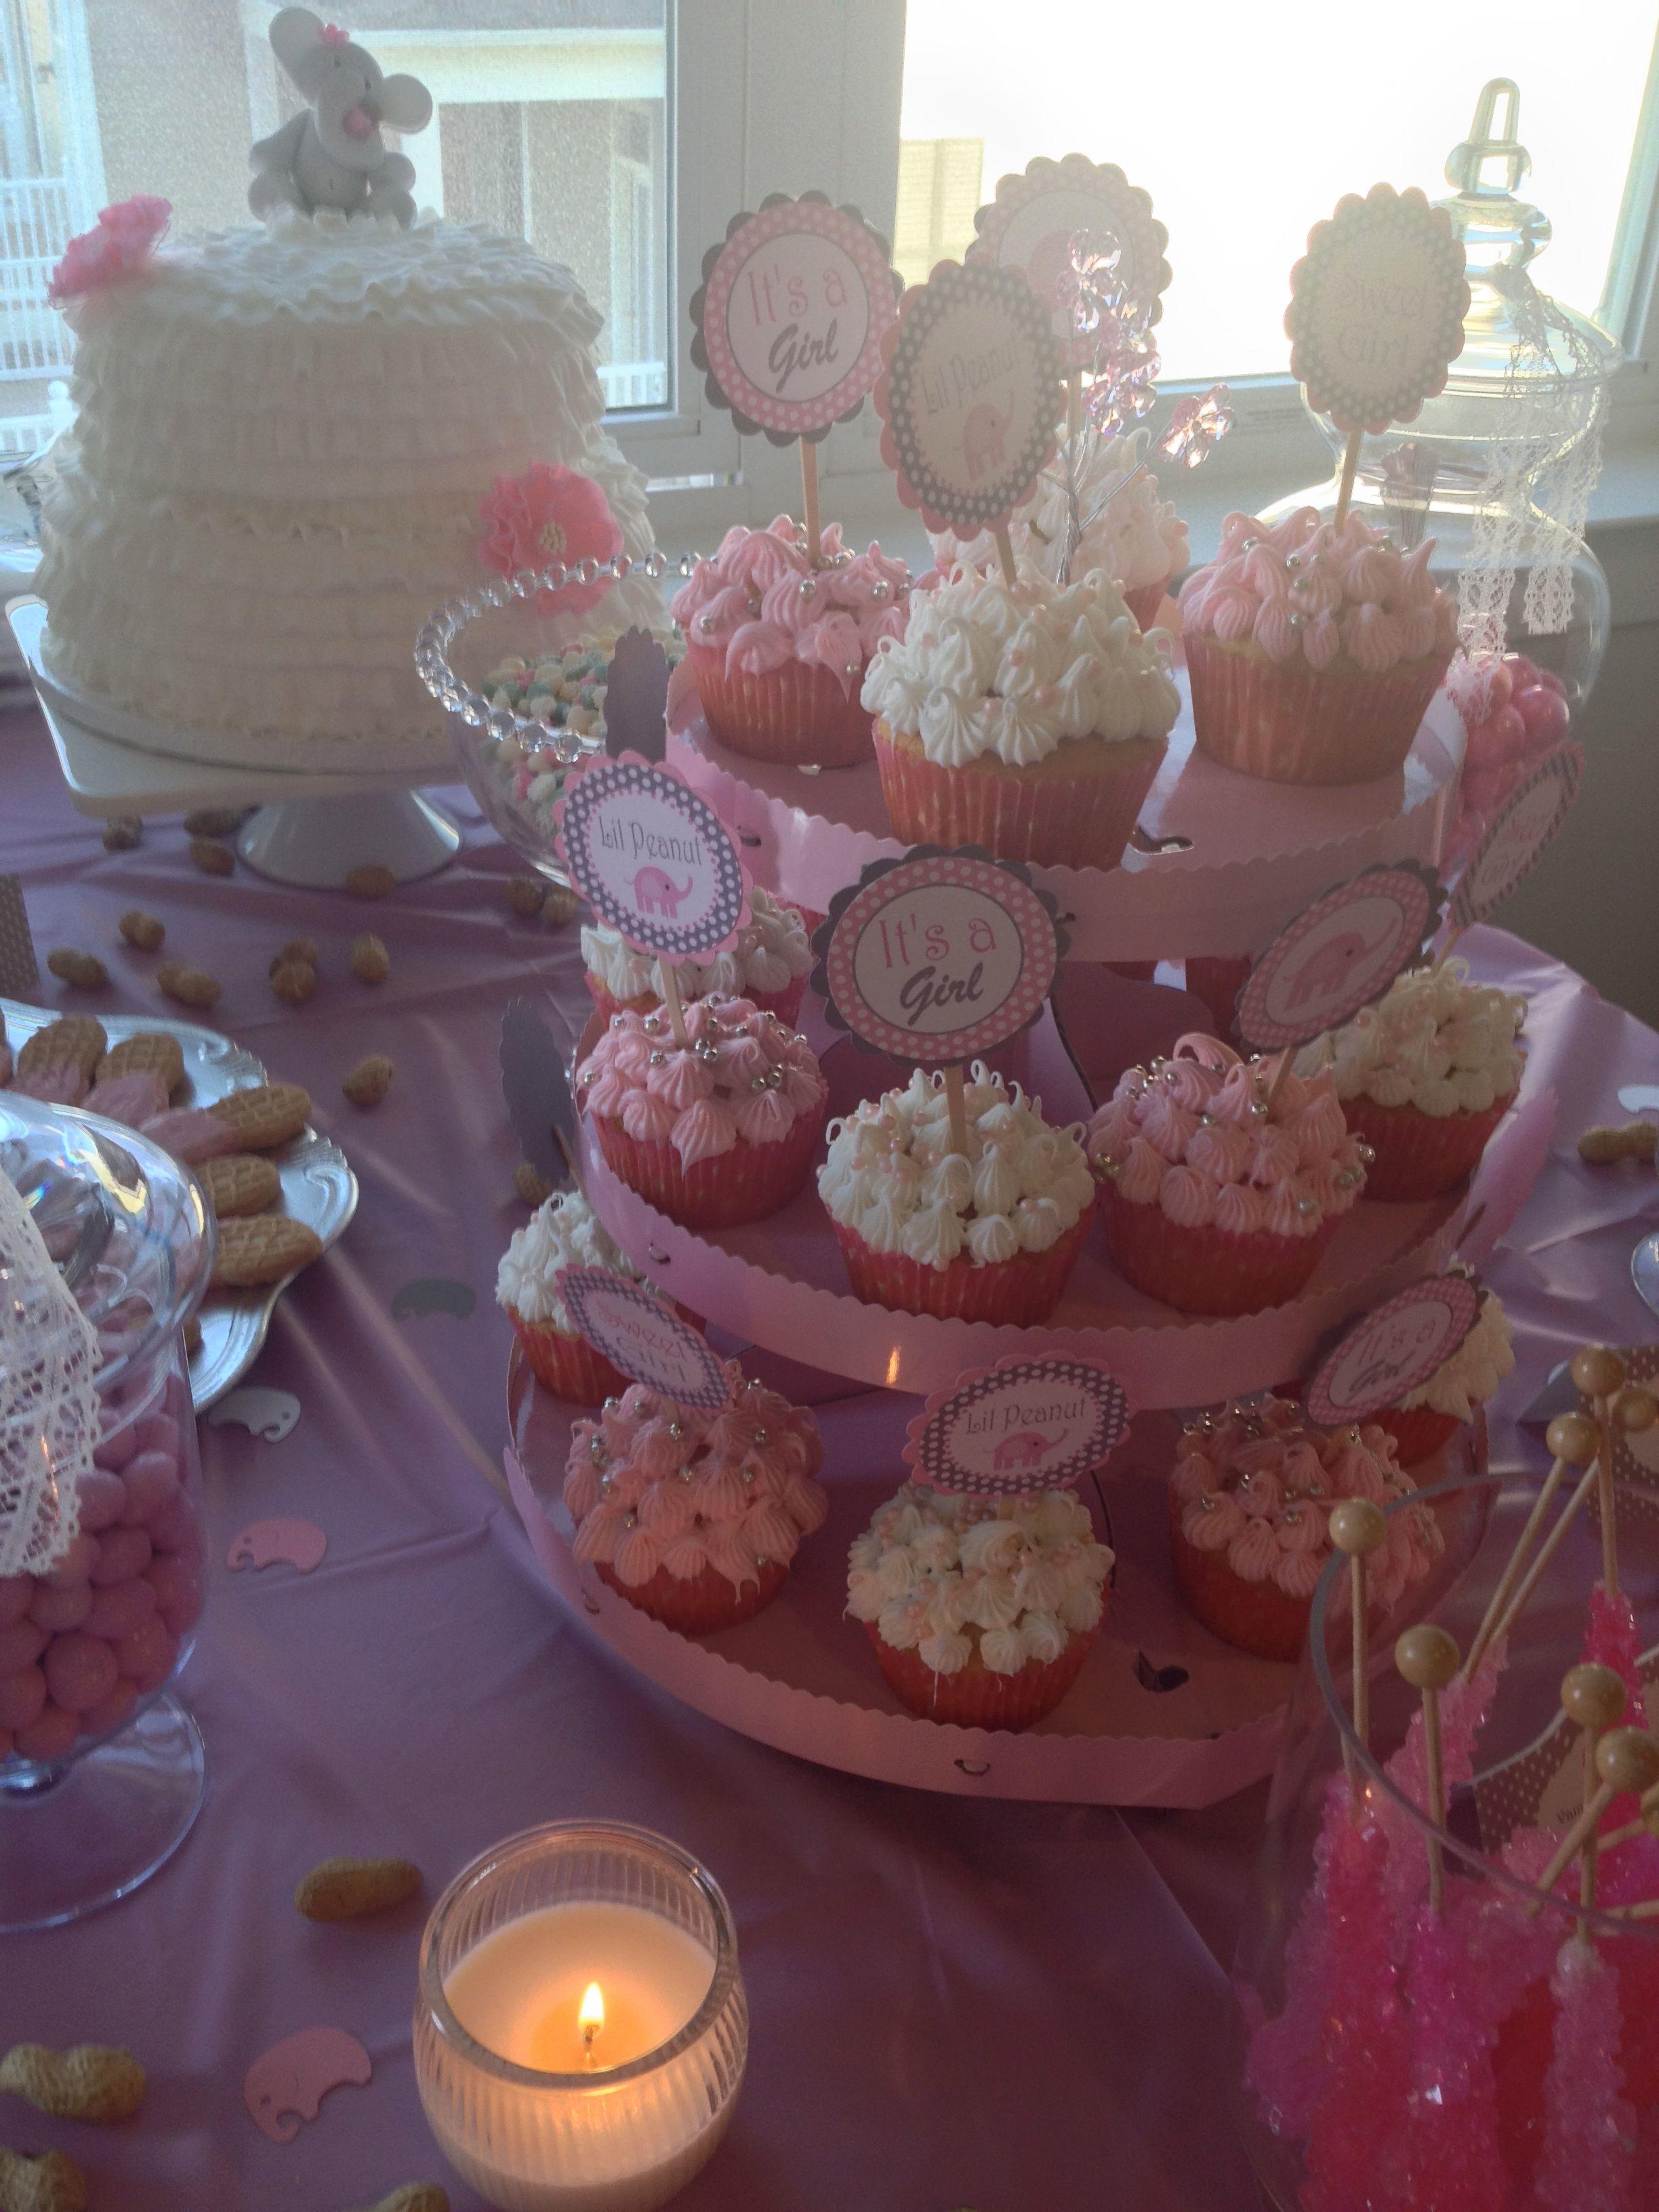 Ivory Cupcake and Wedding Cake Assortment